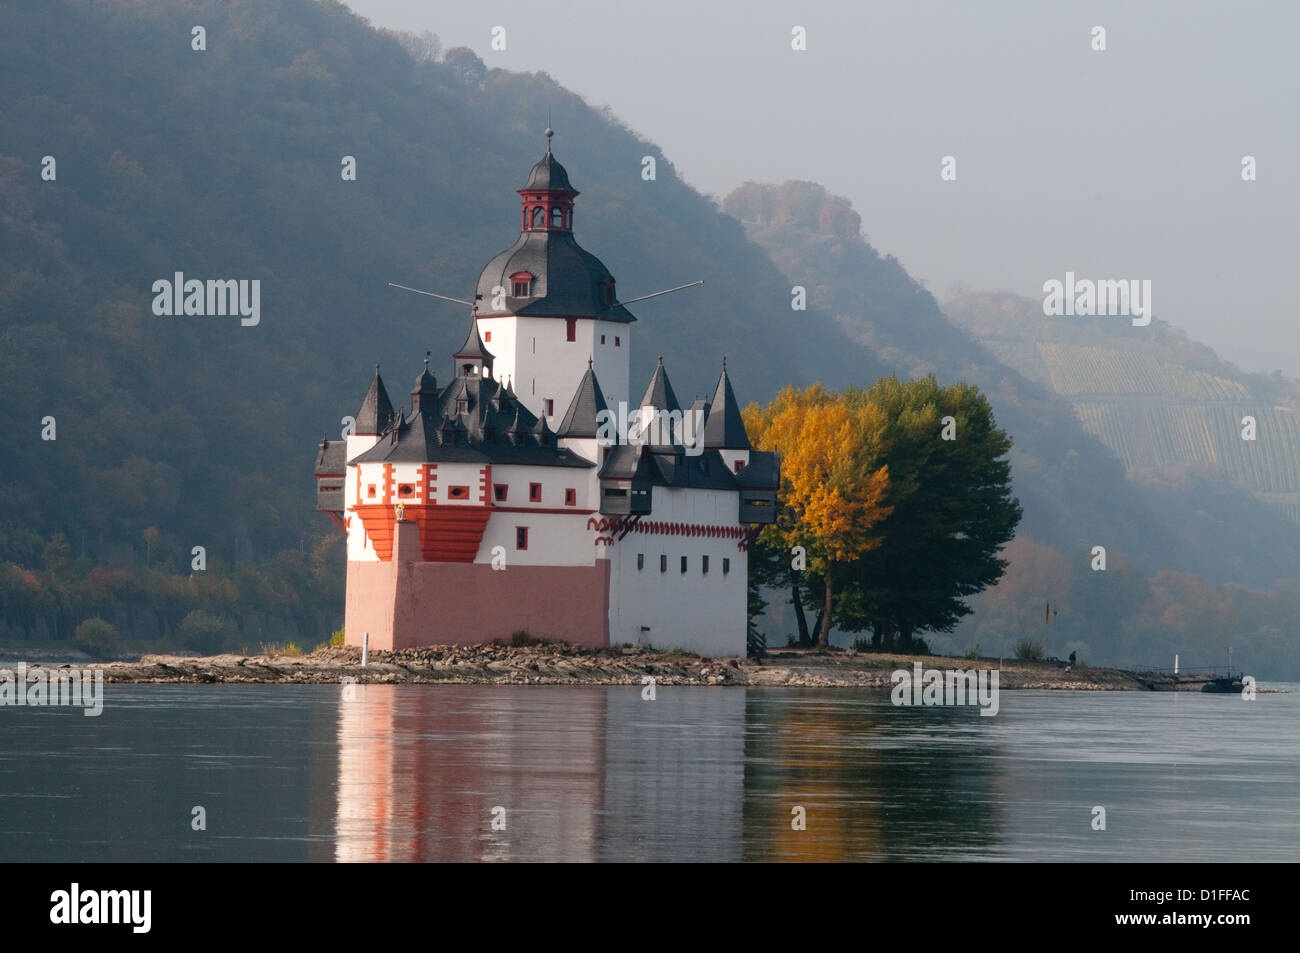 Pfalzgrafenstein toll castle on island in Rhine river, Kaub Stock Photo